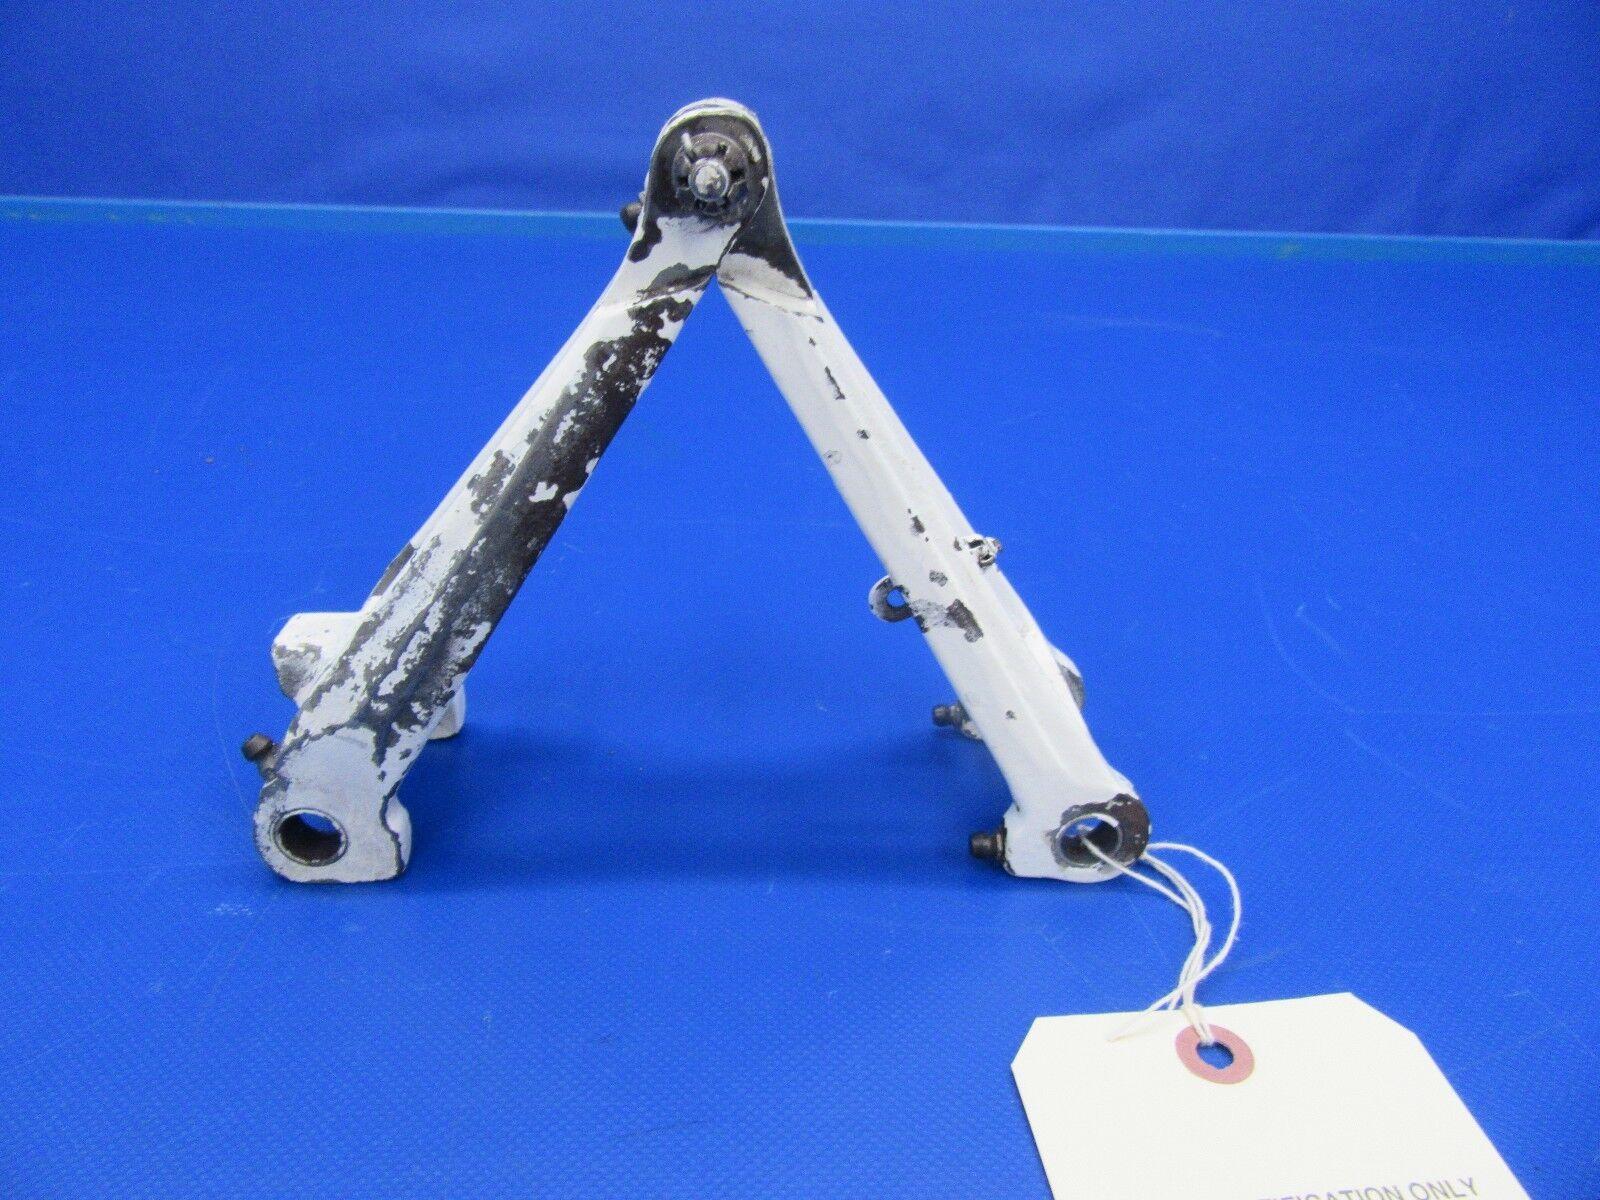 Beech Baron D55 Upper & Lower Knee Main Gear P/N 45-815011-8 (1017-131)